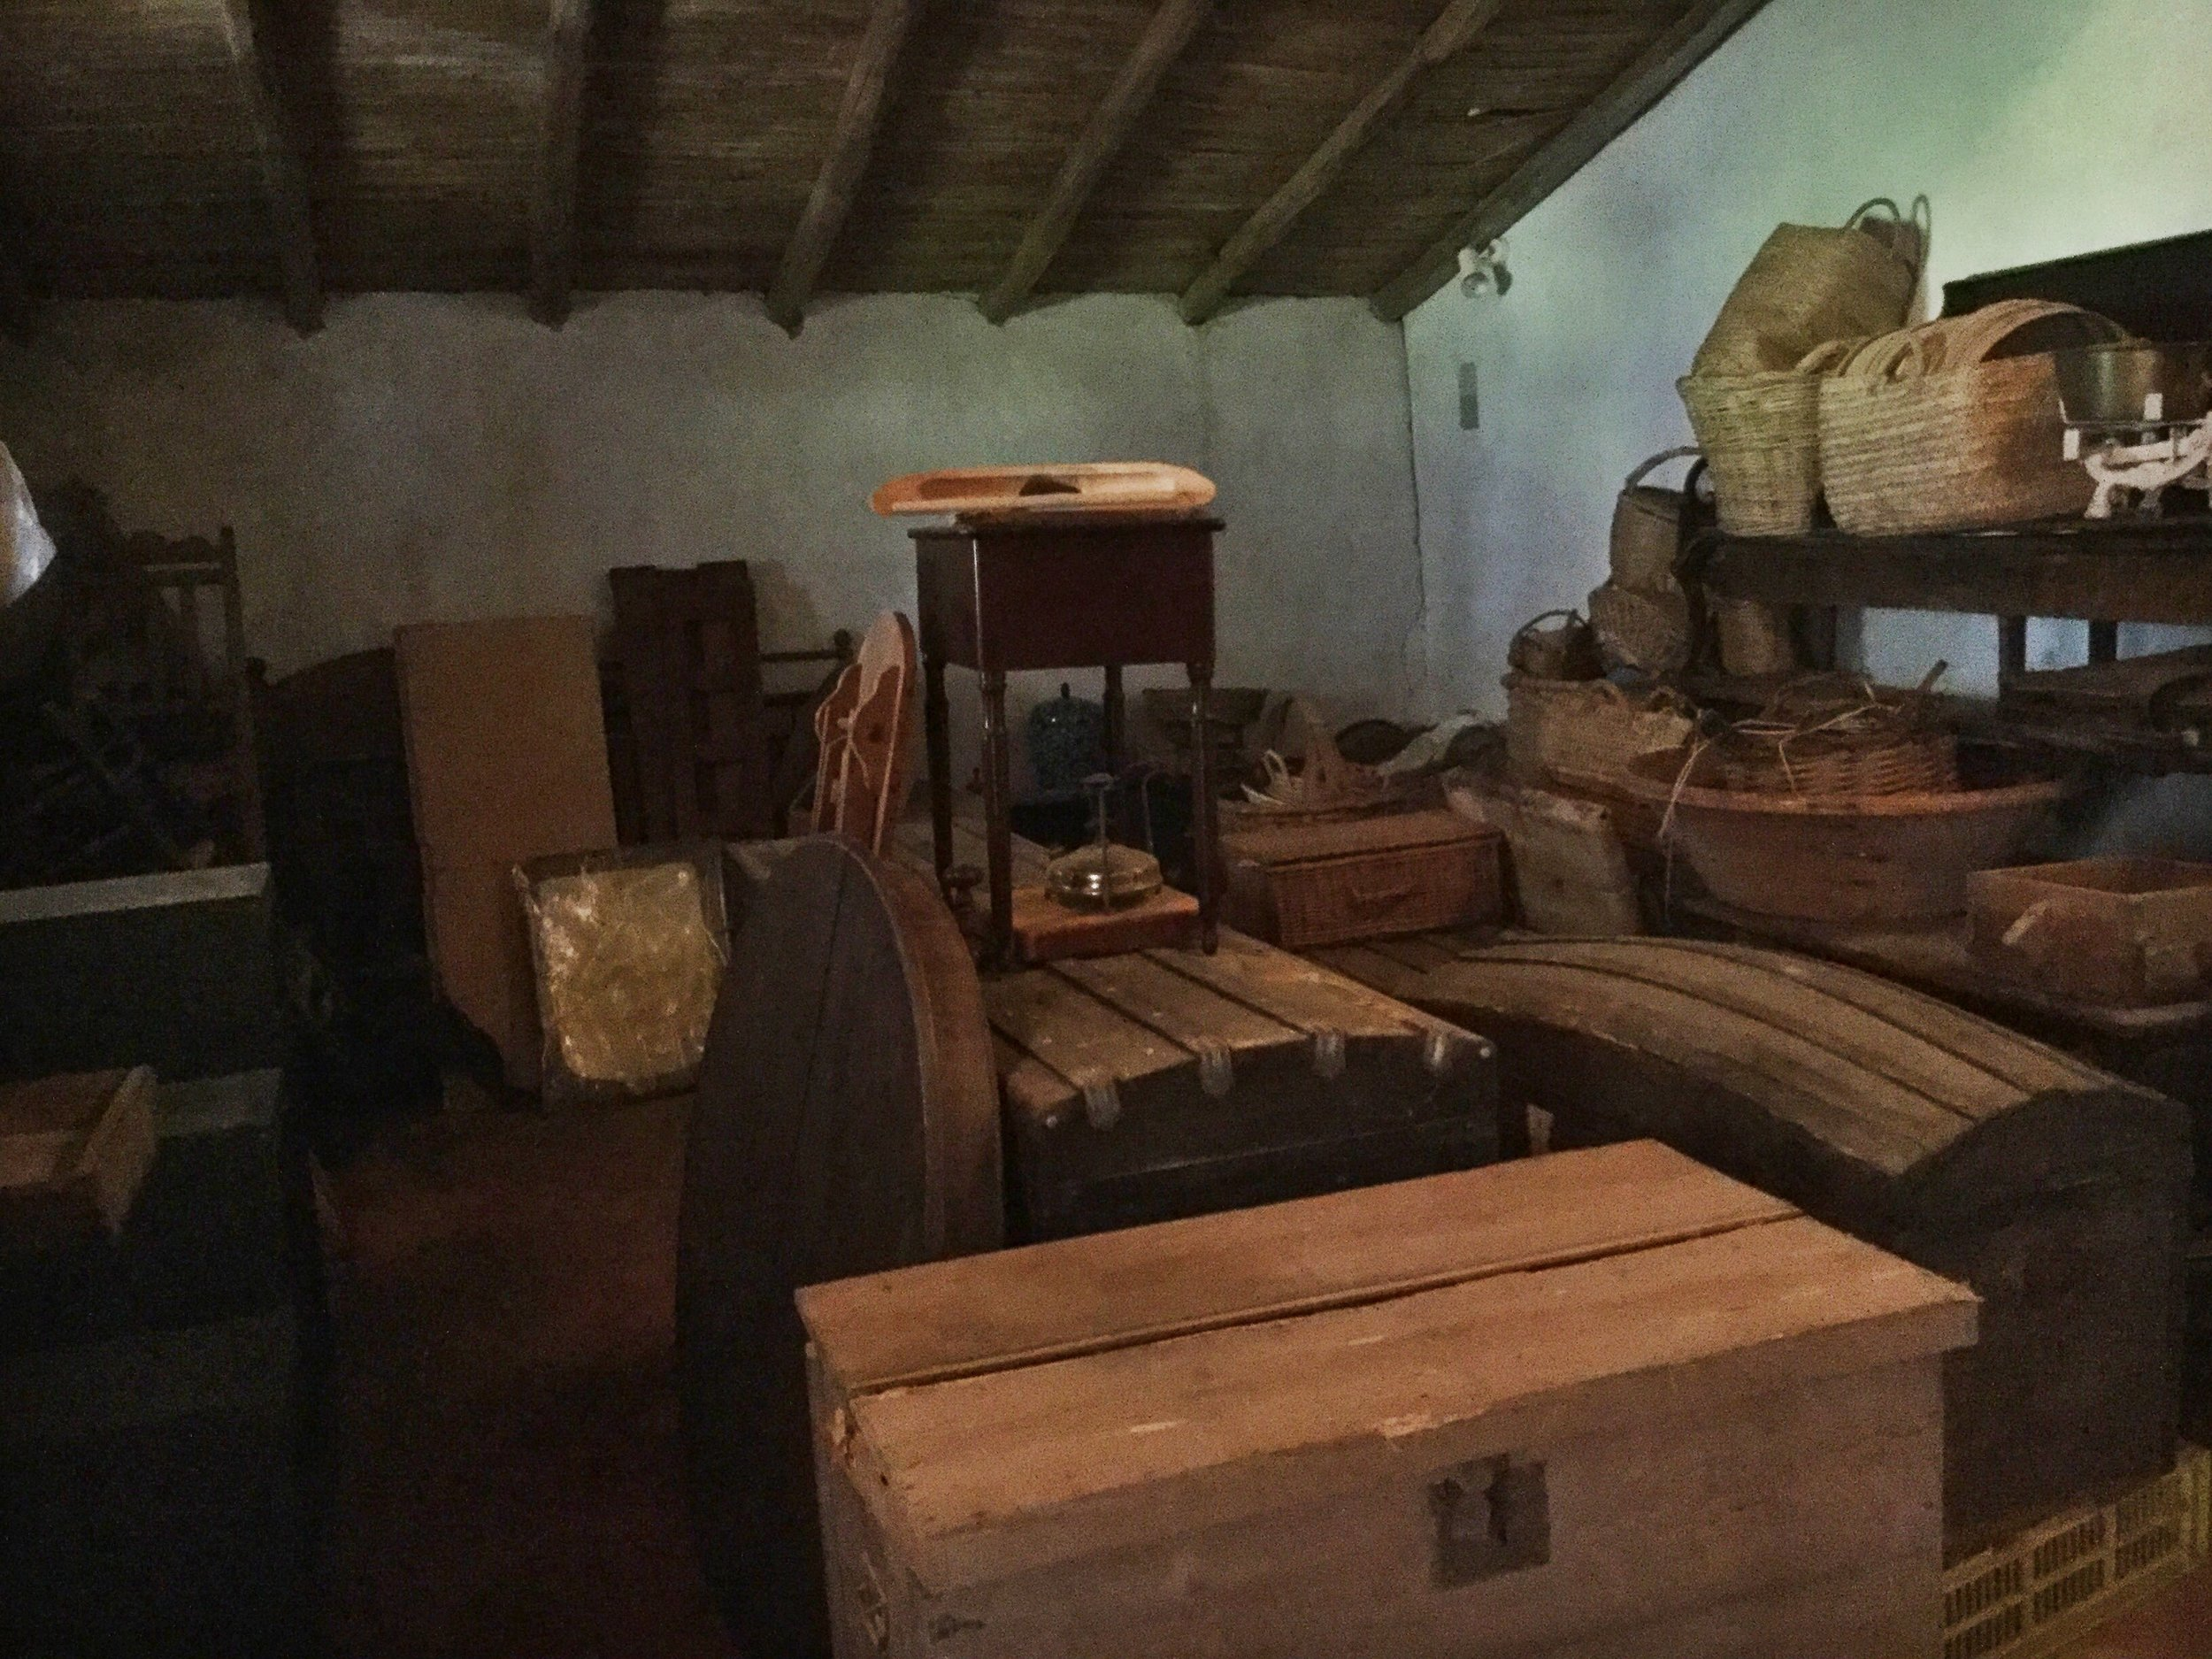 The storeroom, half empty